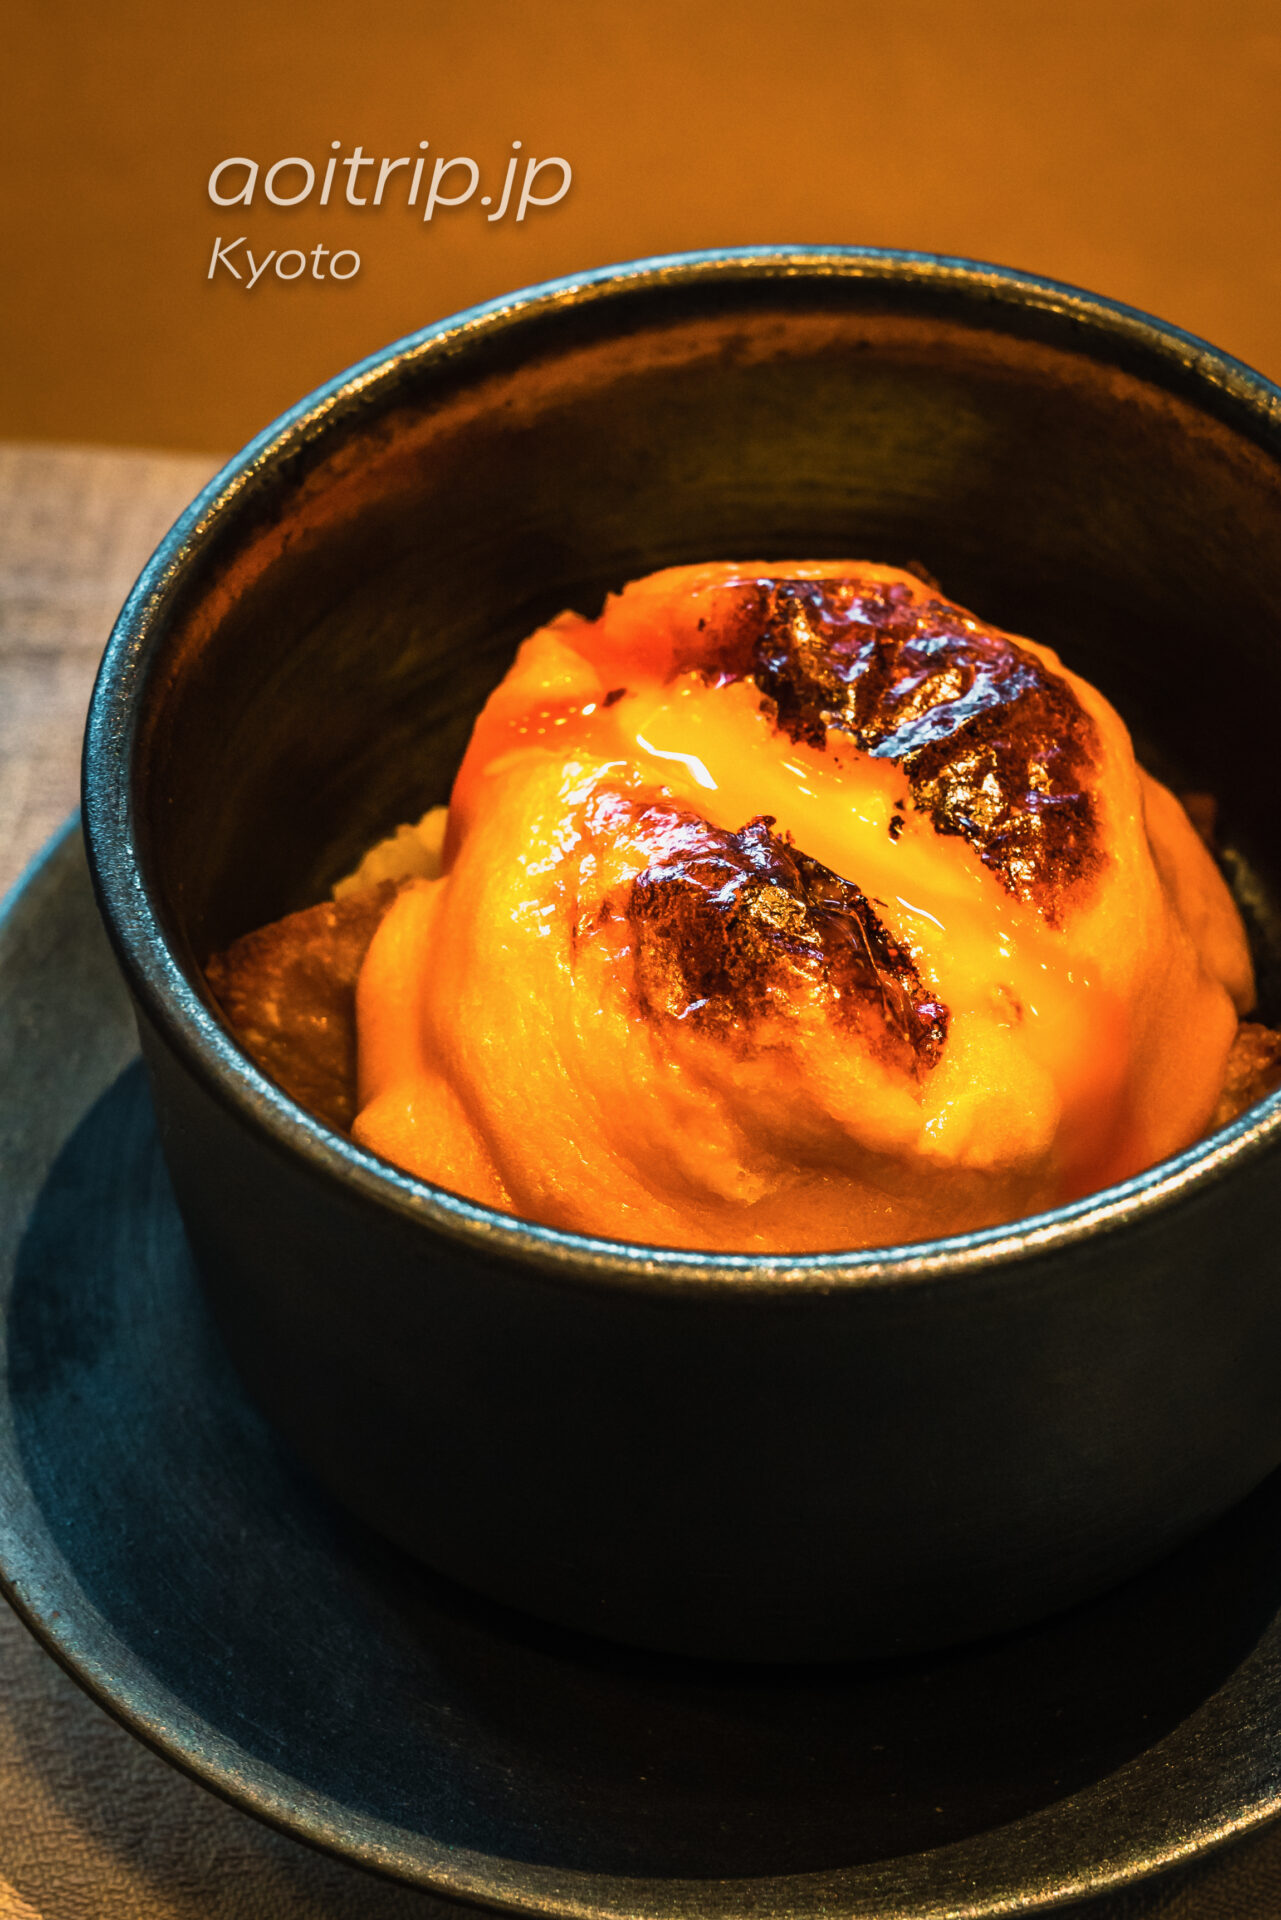 HOTEL THE MITSUI KYOTO, THE GARDEN BARの朝食 アメリカンブレックファスト エッグベネディクトとフレンチトーストの融合 エッグフレディクト西京味噌